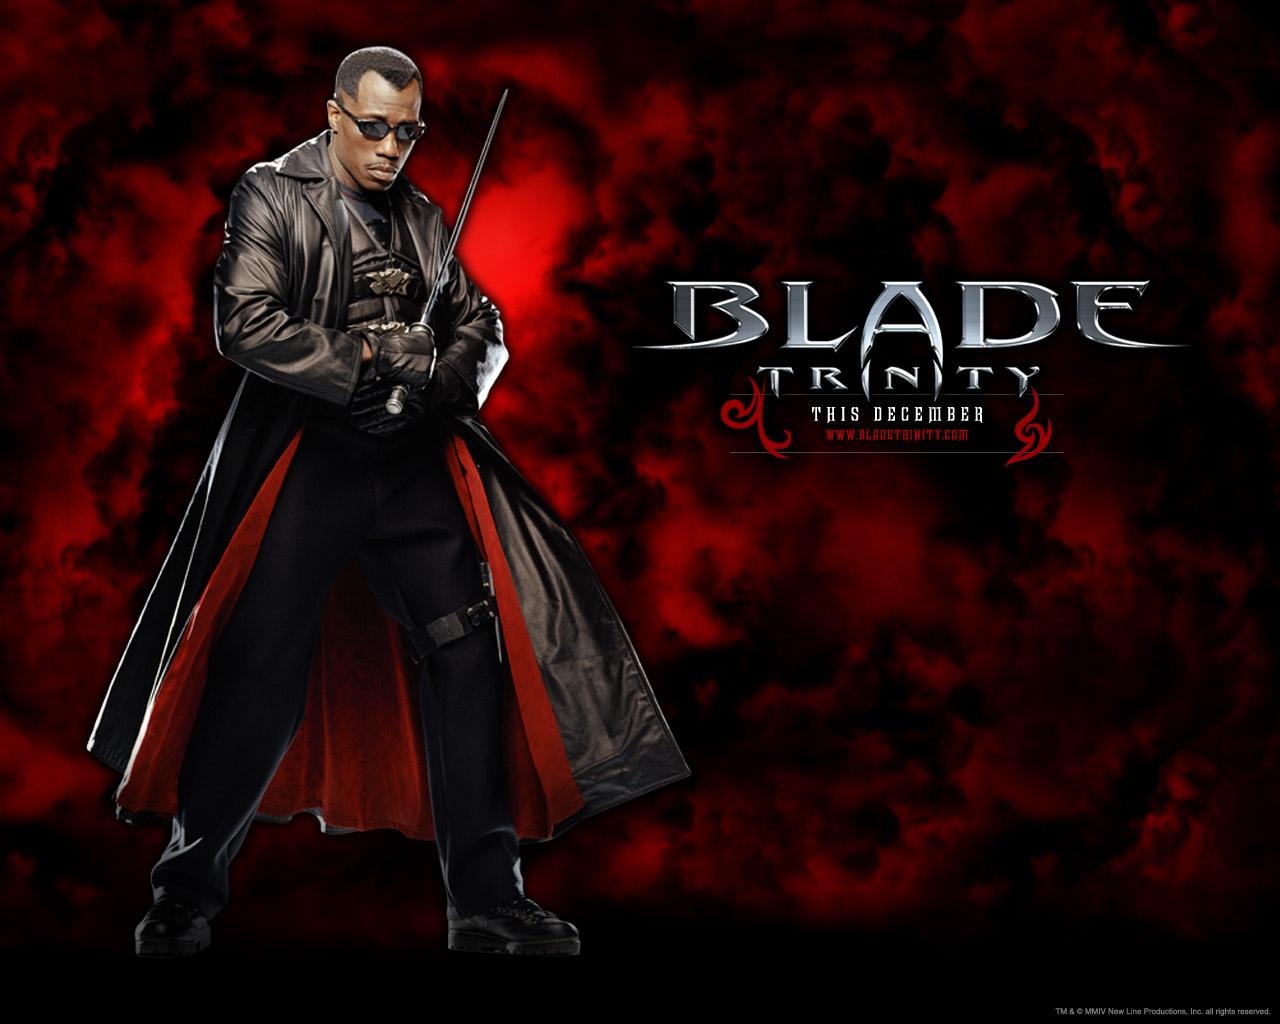 http://4.bp.blogspot.com/_NqLYfqfYn0k/TIvfWn7AJLI/AAAAAAAARNI/jcCQK-3P1-E/s1600/Blade_3-018.jpg